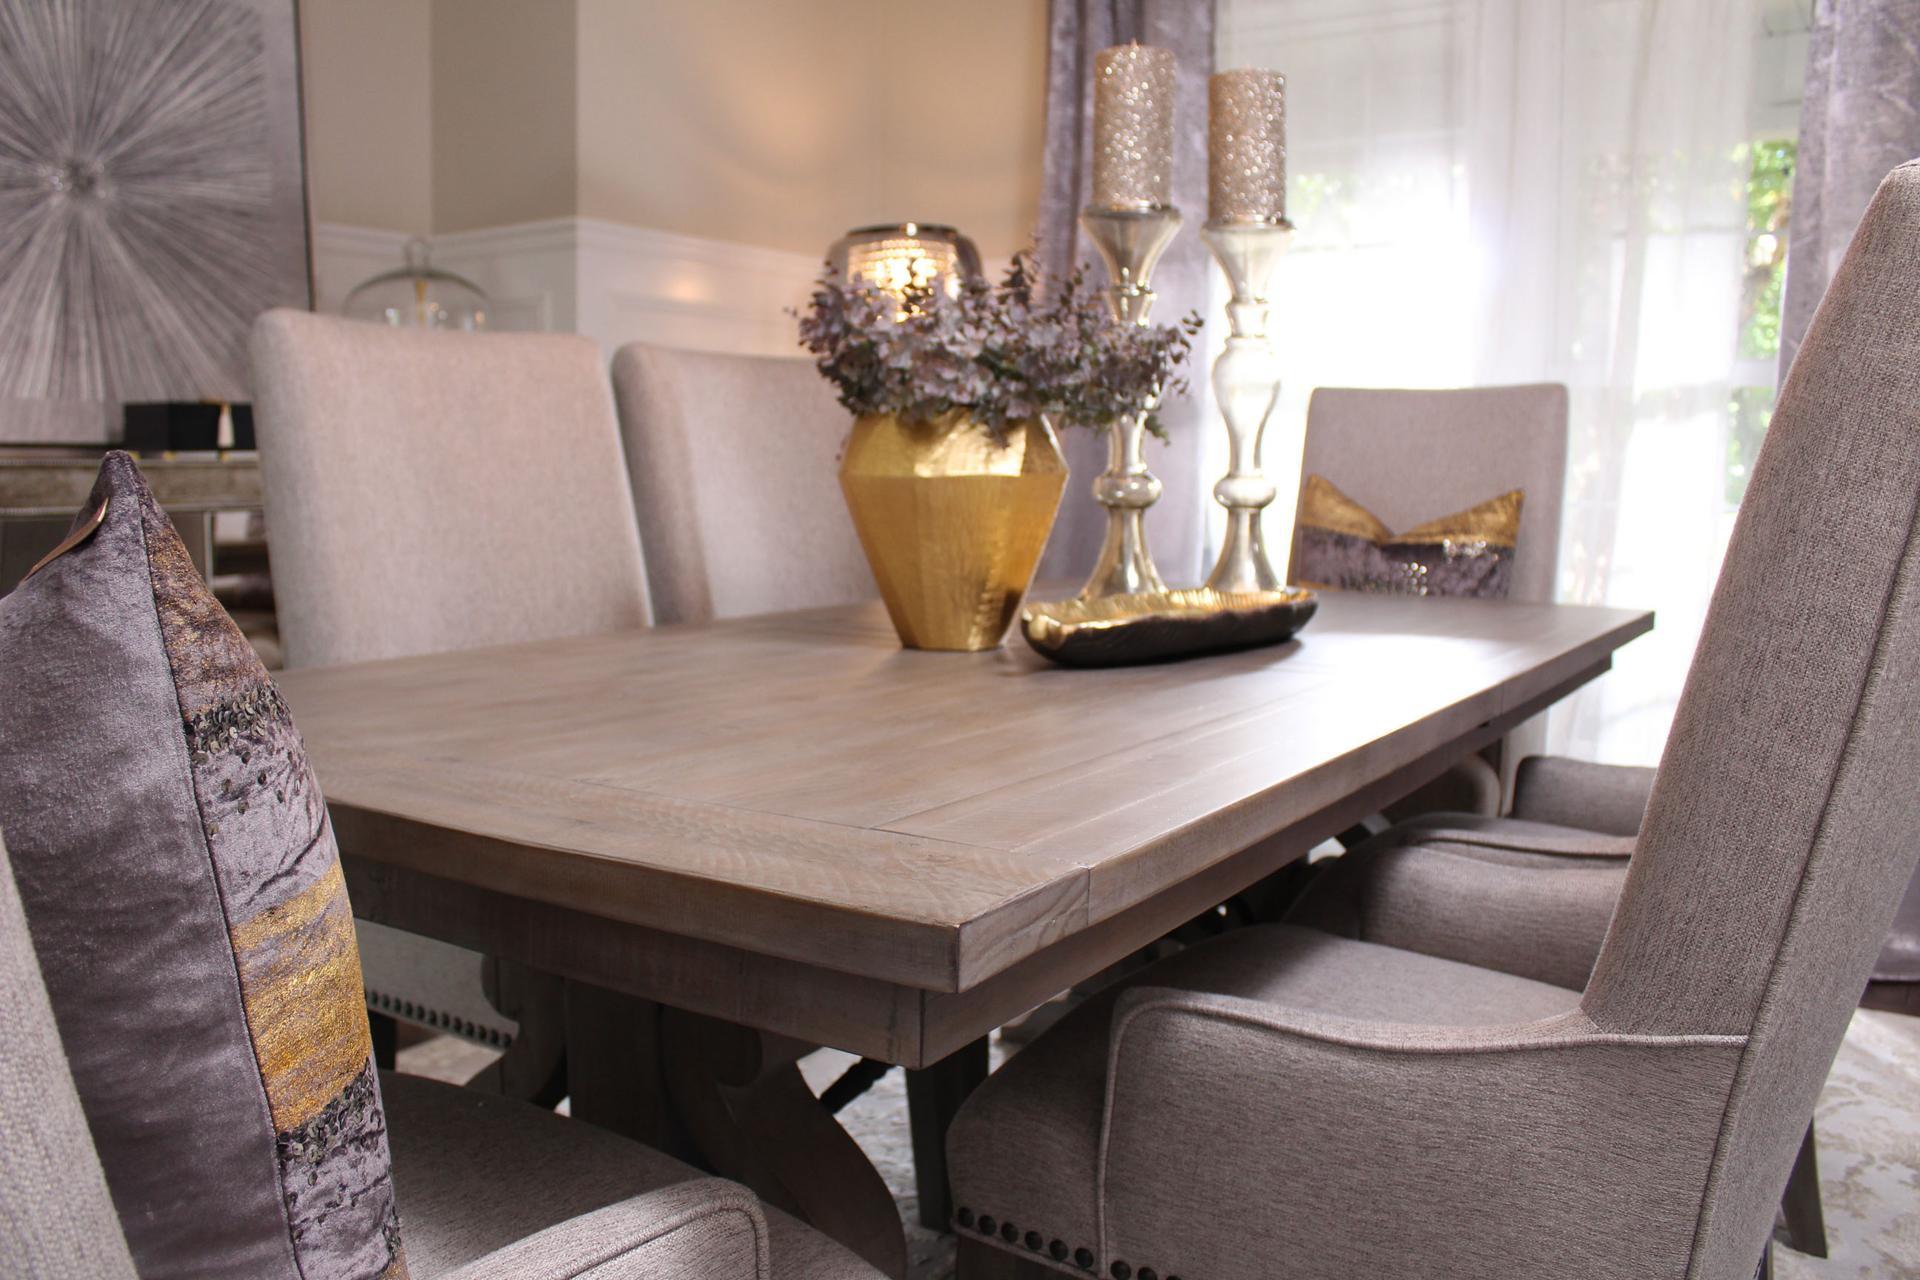 farahjmerhi style insider inspiration room makeover image 13